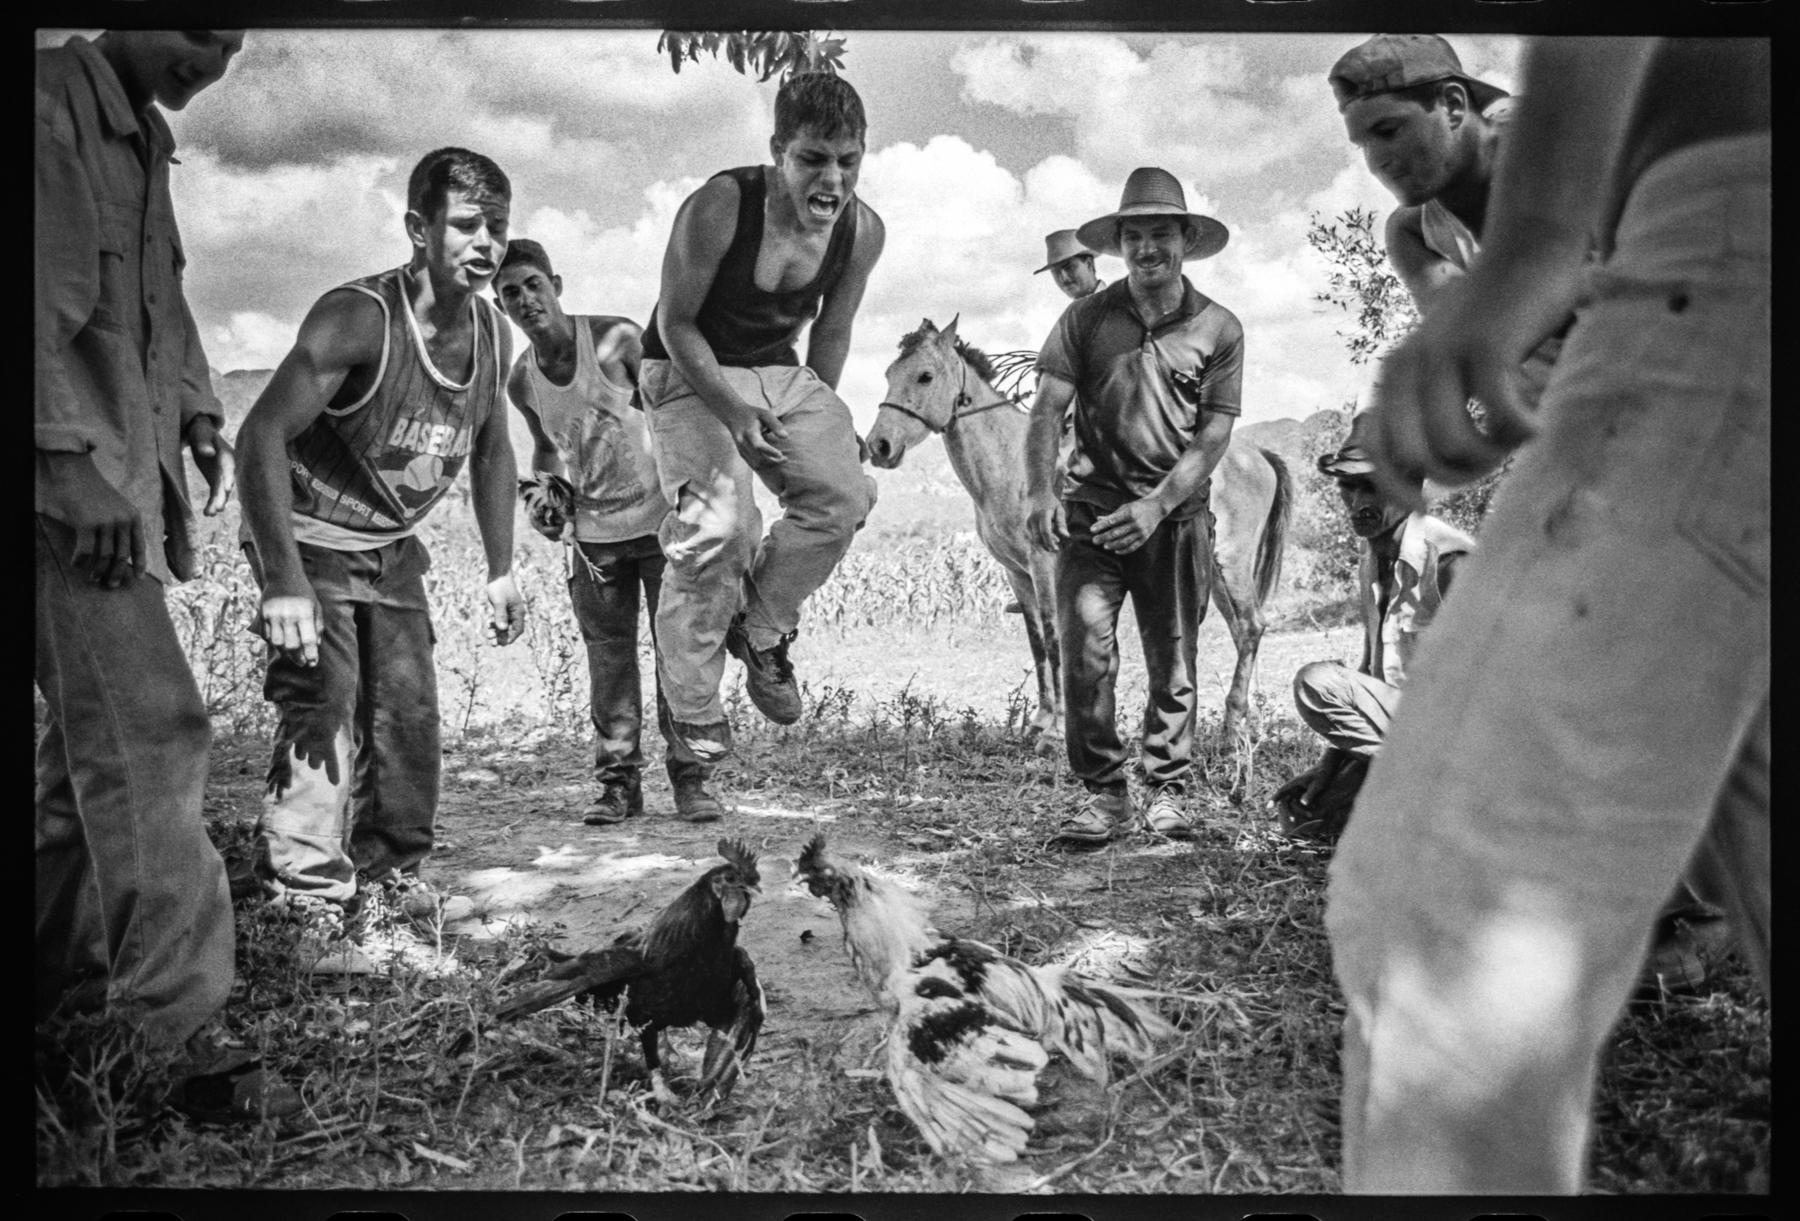 Cockfight Viñales, Cuba, 2003